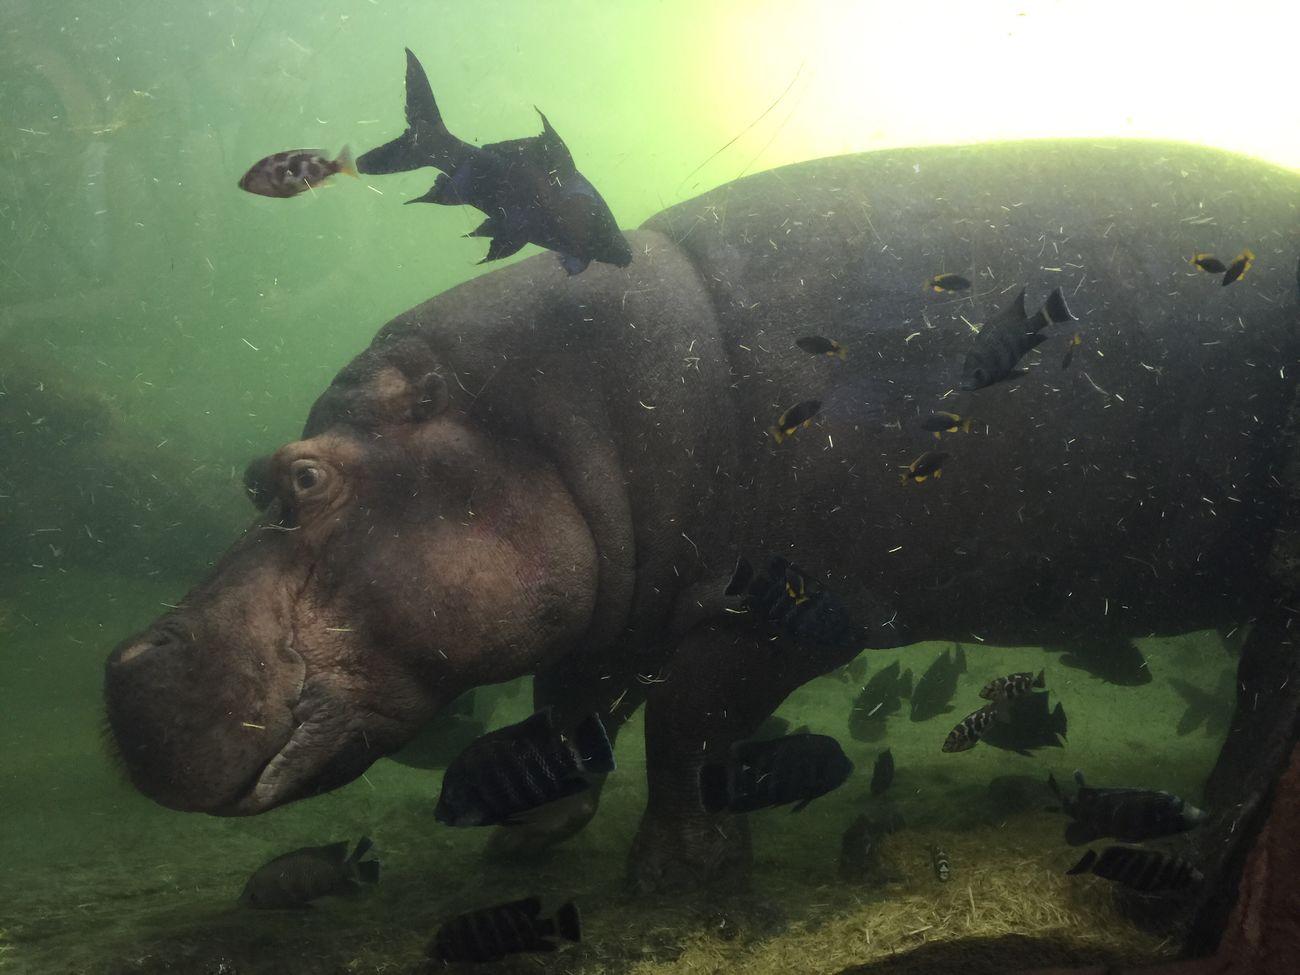 #nofilter Nofilter Noedit Hipopotamó Bioparc Fish Vacations Water Nature IPhoneography IPhone Iphoneonly